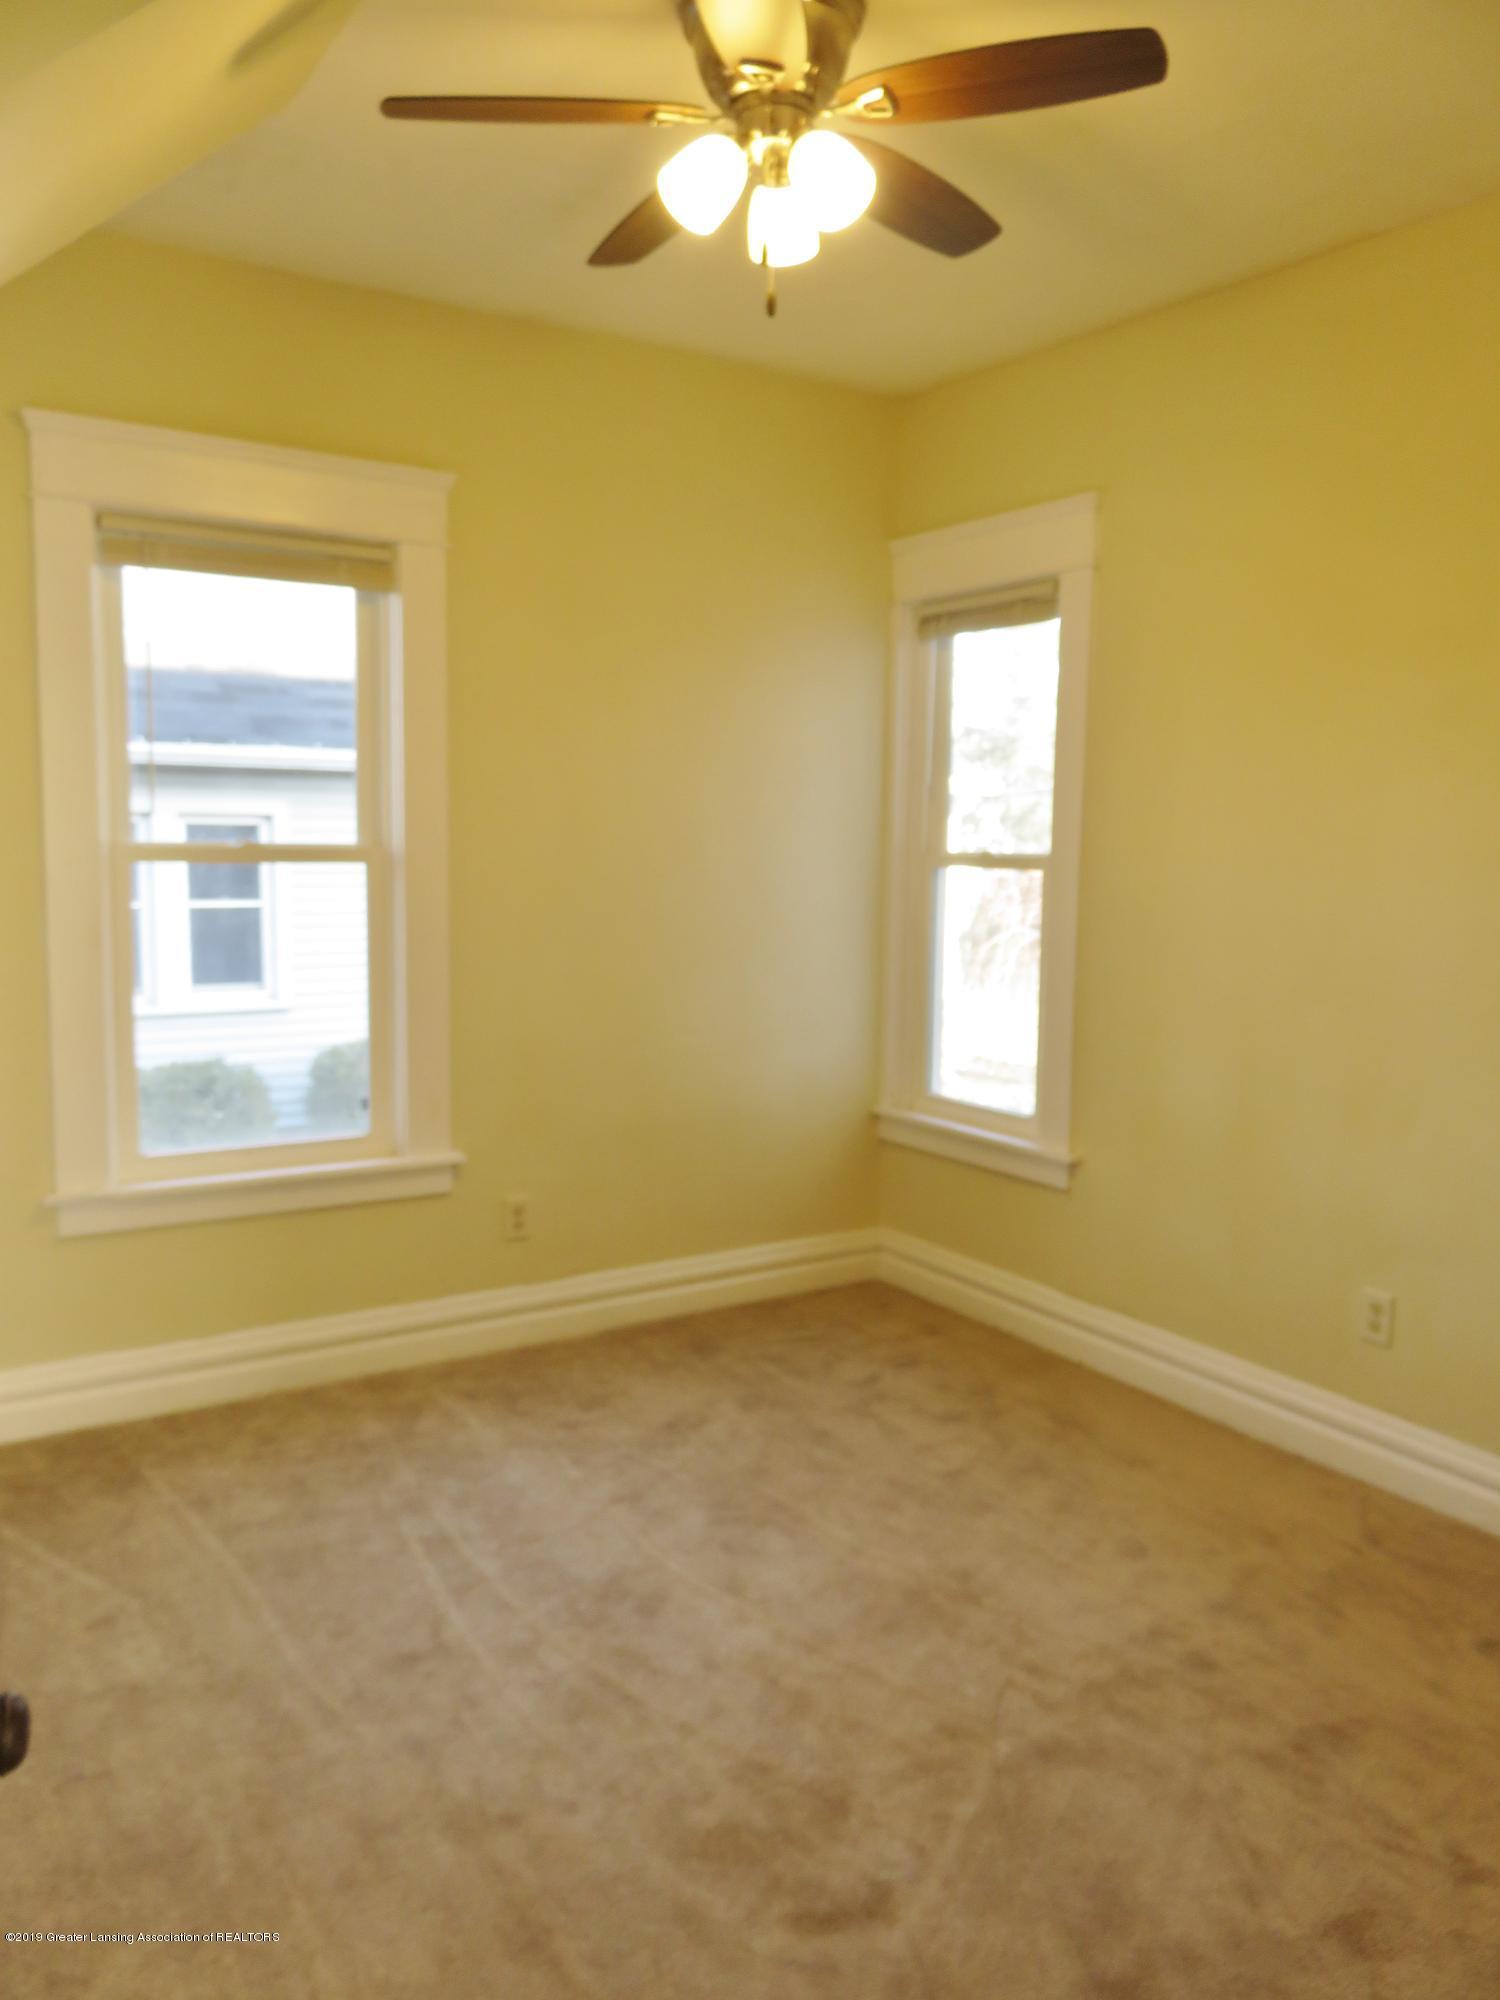 1201 Princeton Ave - 1st Floor Bedroom - 18